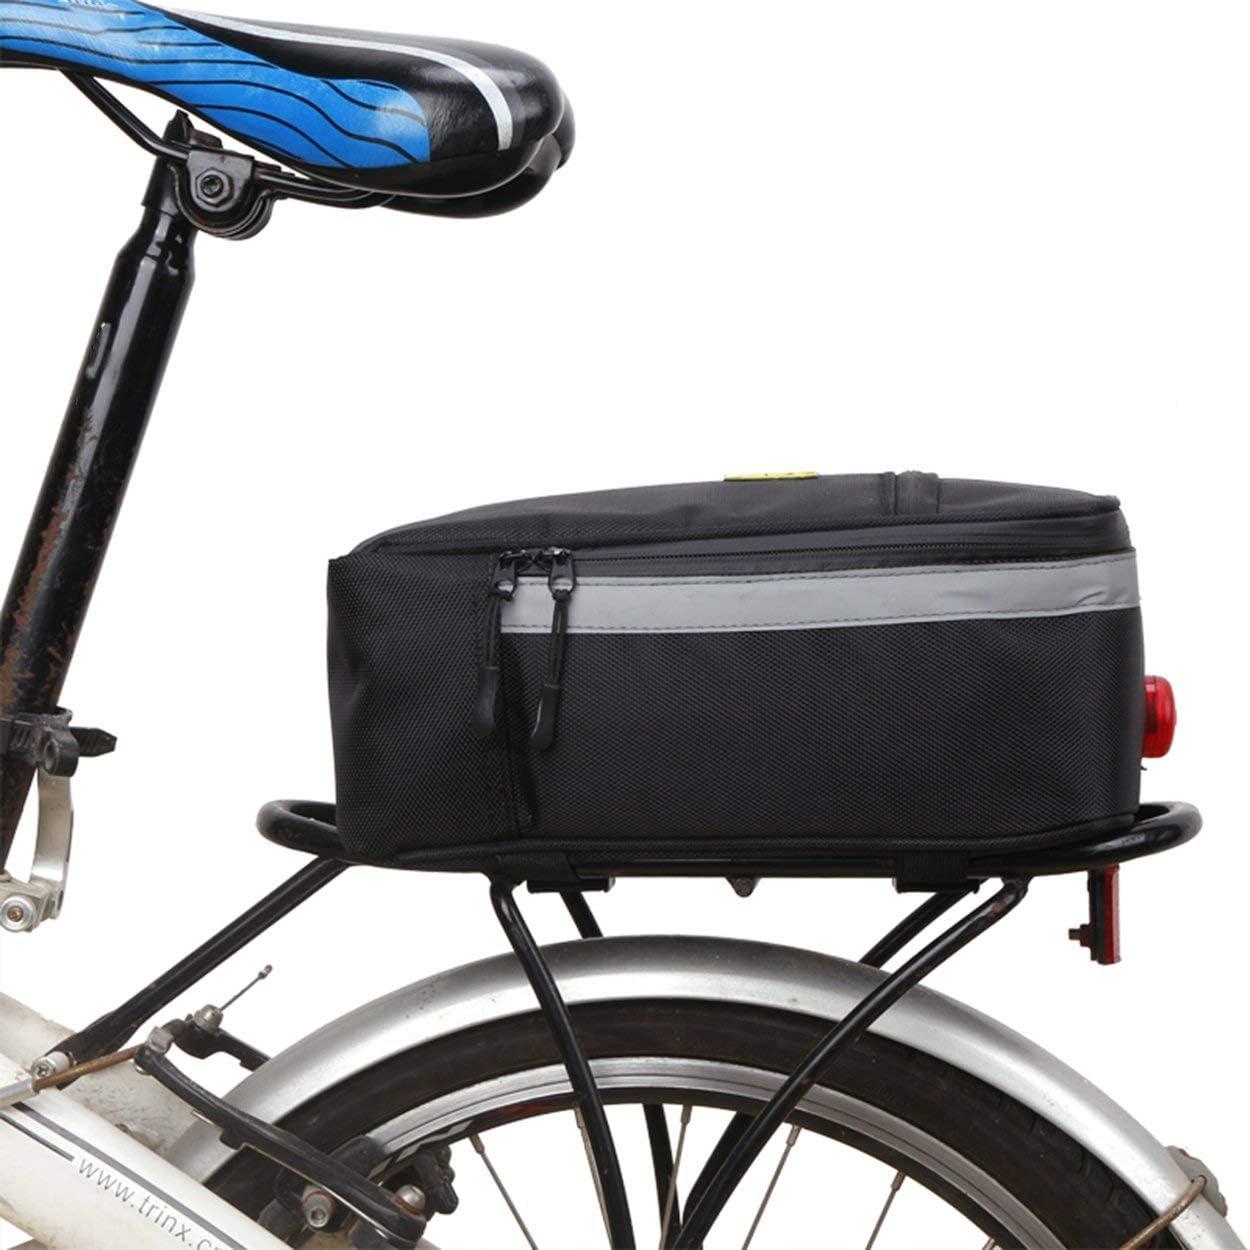 Lorenlli Fit B-Soul Borsa per Bicicletta Posteriore Multifunzionale Borsa per Baule Posteriore Impermeabile Borsa per Bici Posteriore Accessori per Mountain Bike